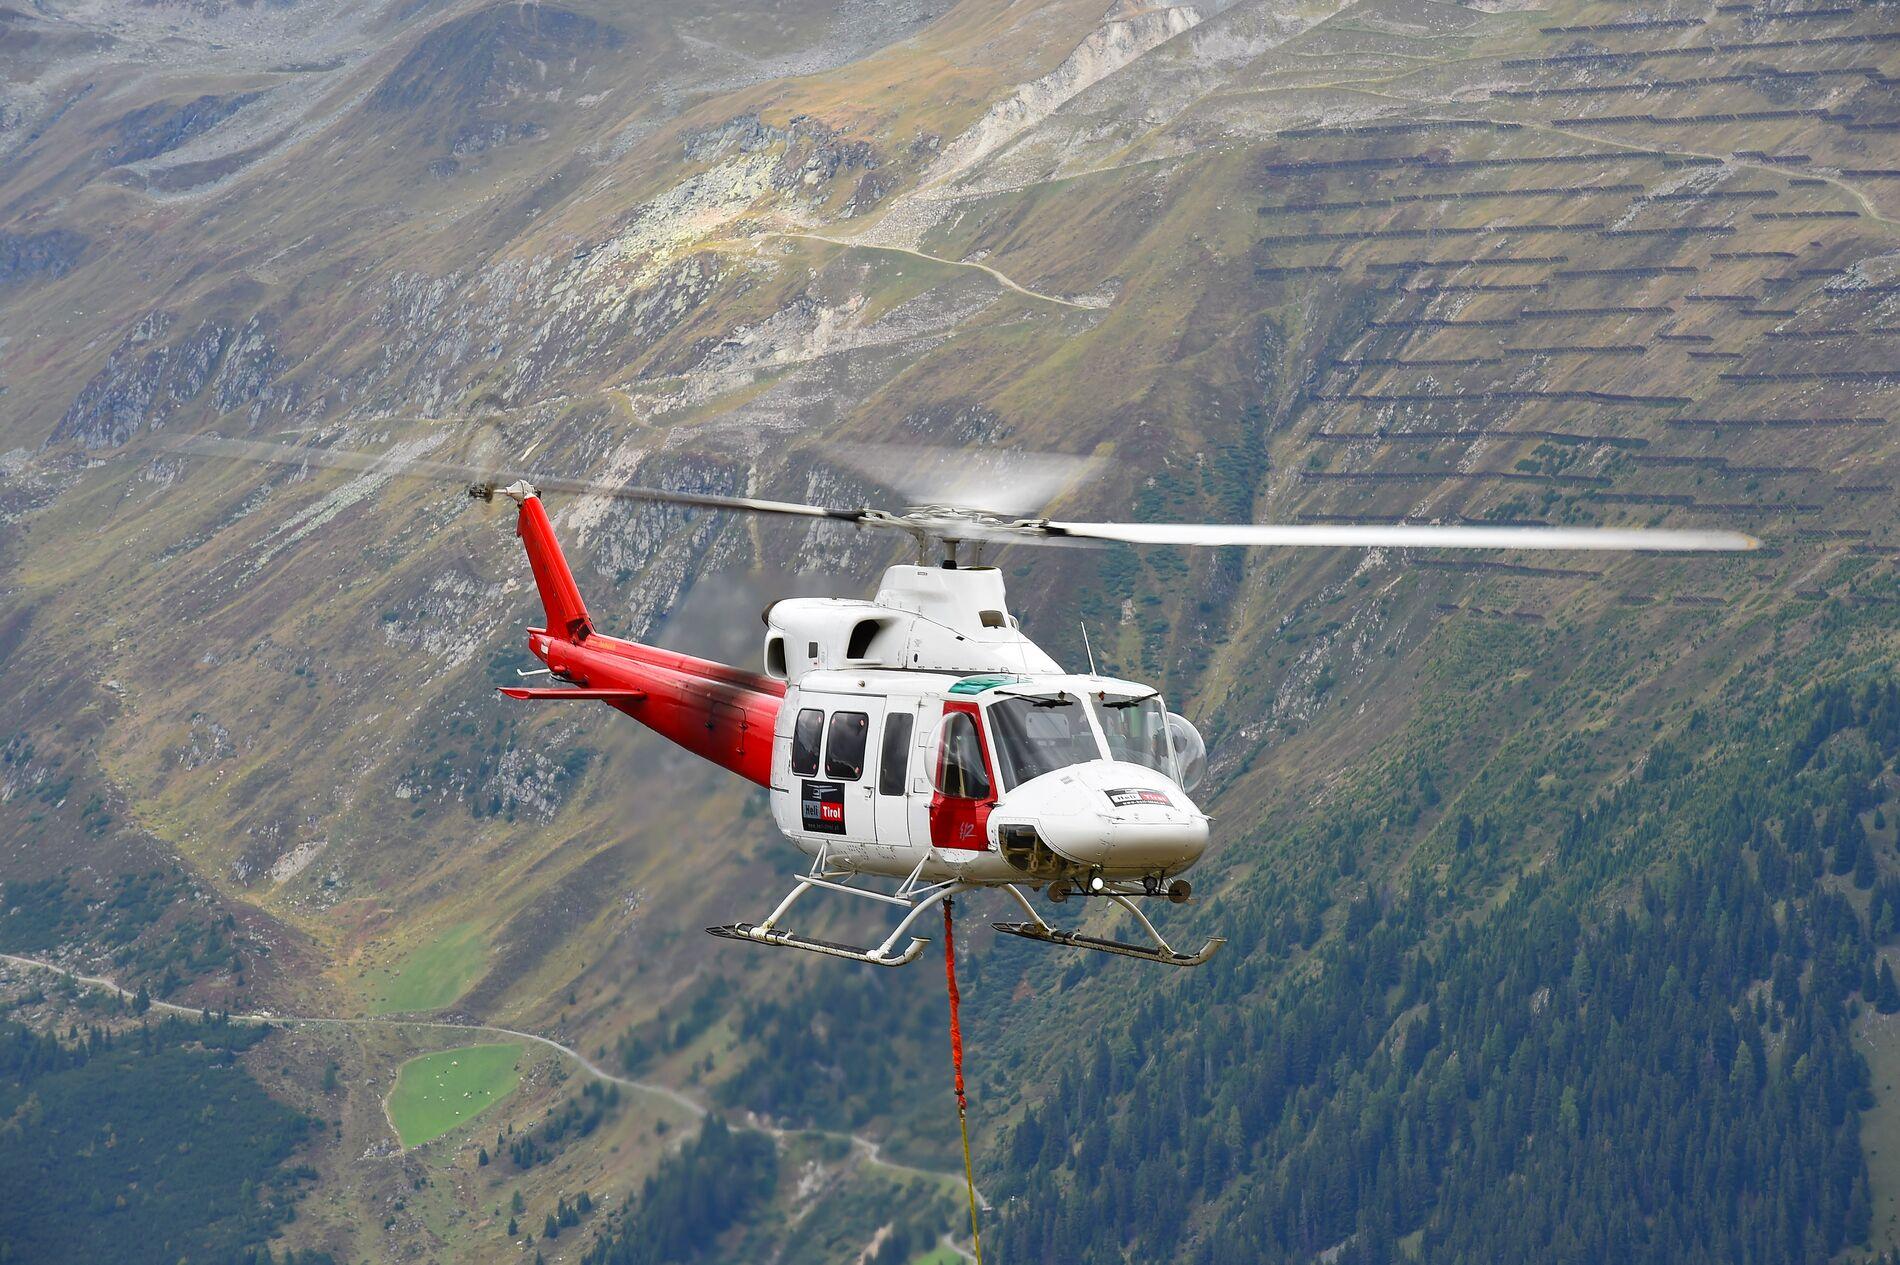 Web_Hero-412HP_Photo_Heli-Tirol-04941_140918-R00_publish_412HP_Photo_Heli-Tirol-04941_140918-R00.psd_v001